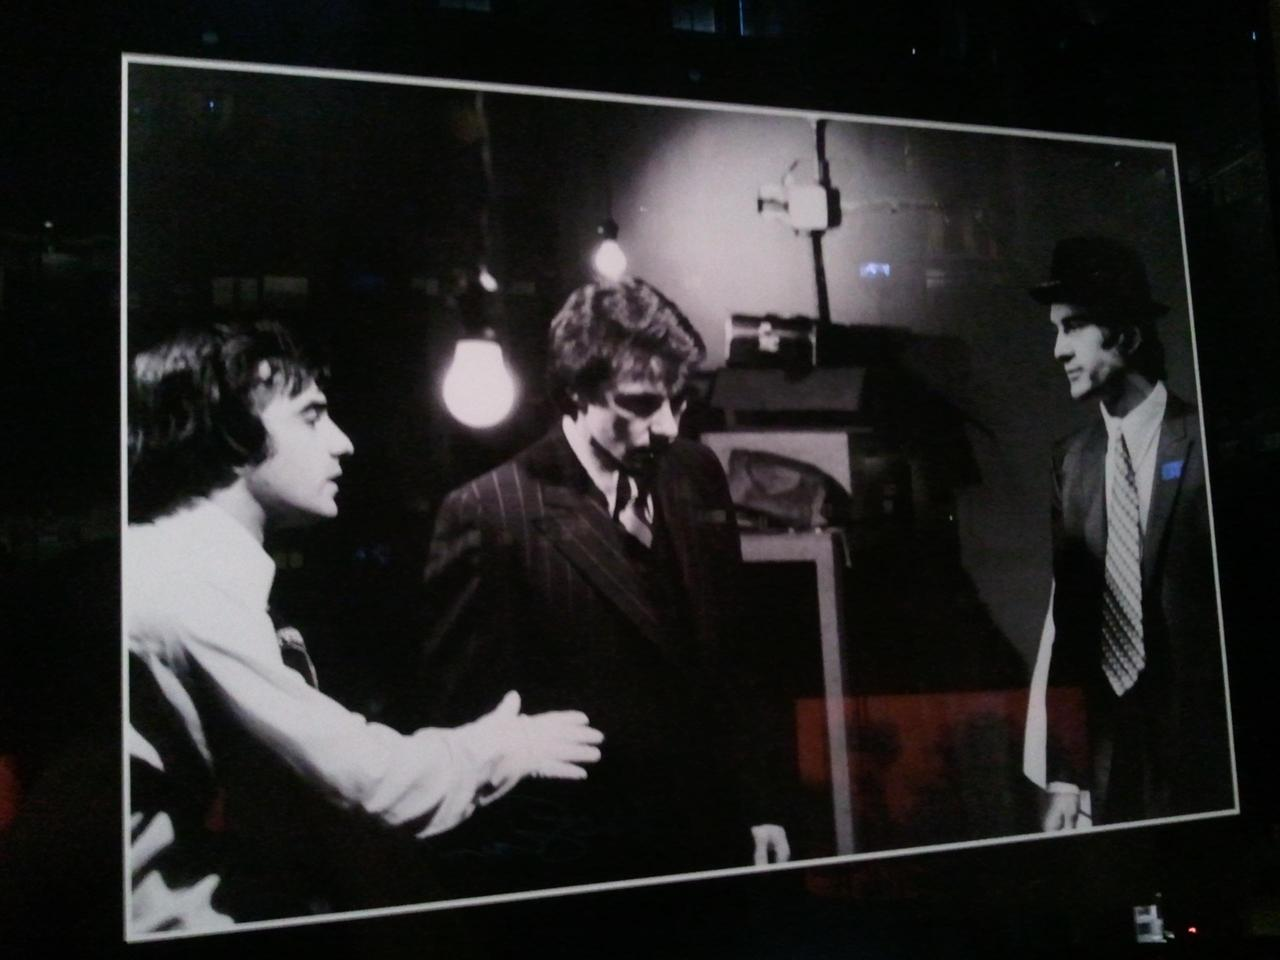 Martin Scorsece, Harvey Keitel & Robert De Niro On the SetMean Streets (1973)